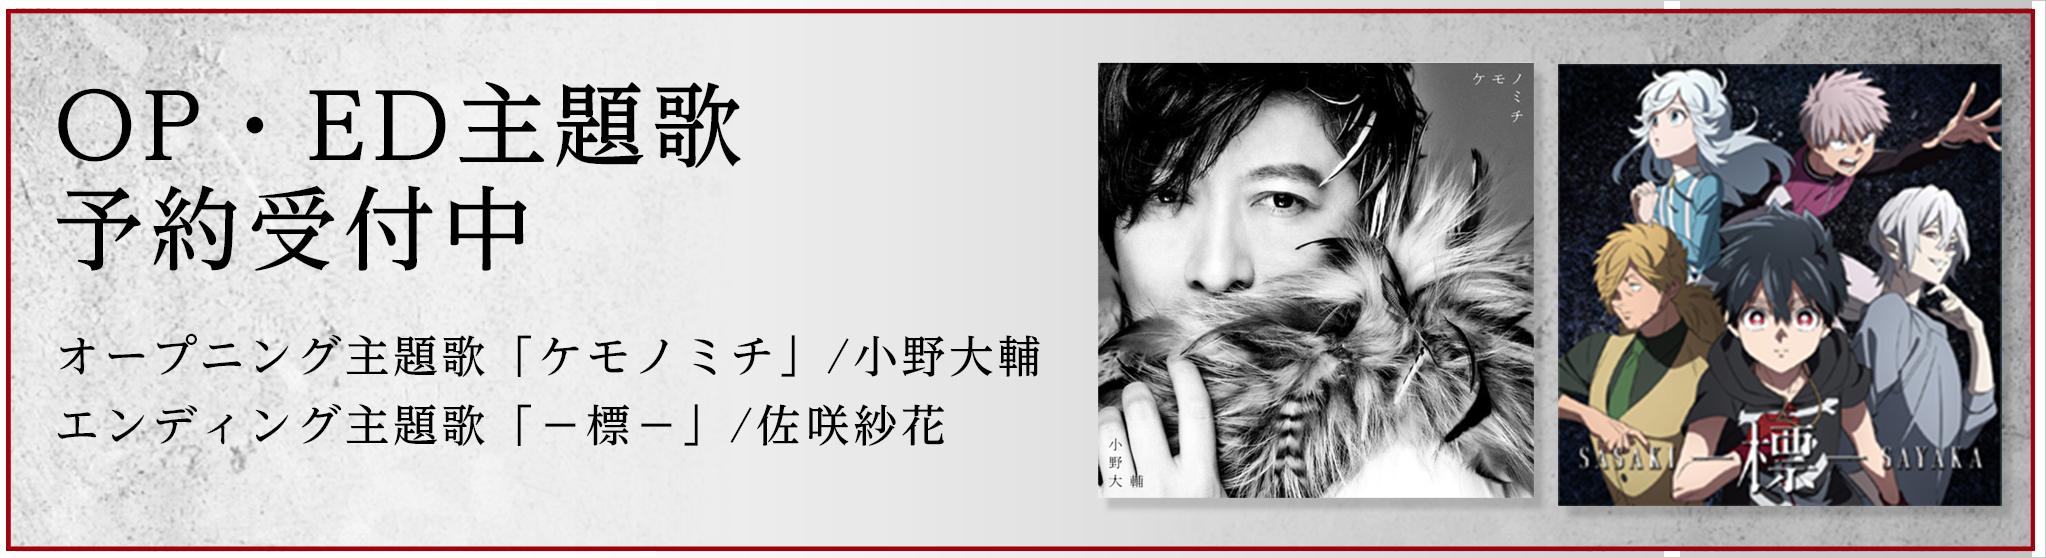 OP・ED主題歌 予約受付中                 オープニング主題歌「ケモノミチ」/小野大輔                 エンディング主題歌「-標-」/佐咲紗花